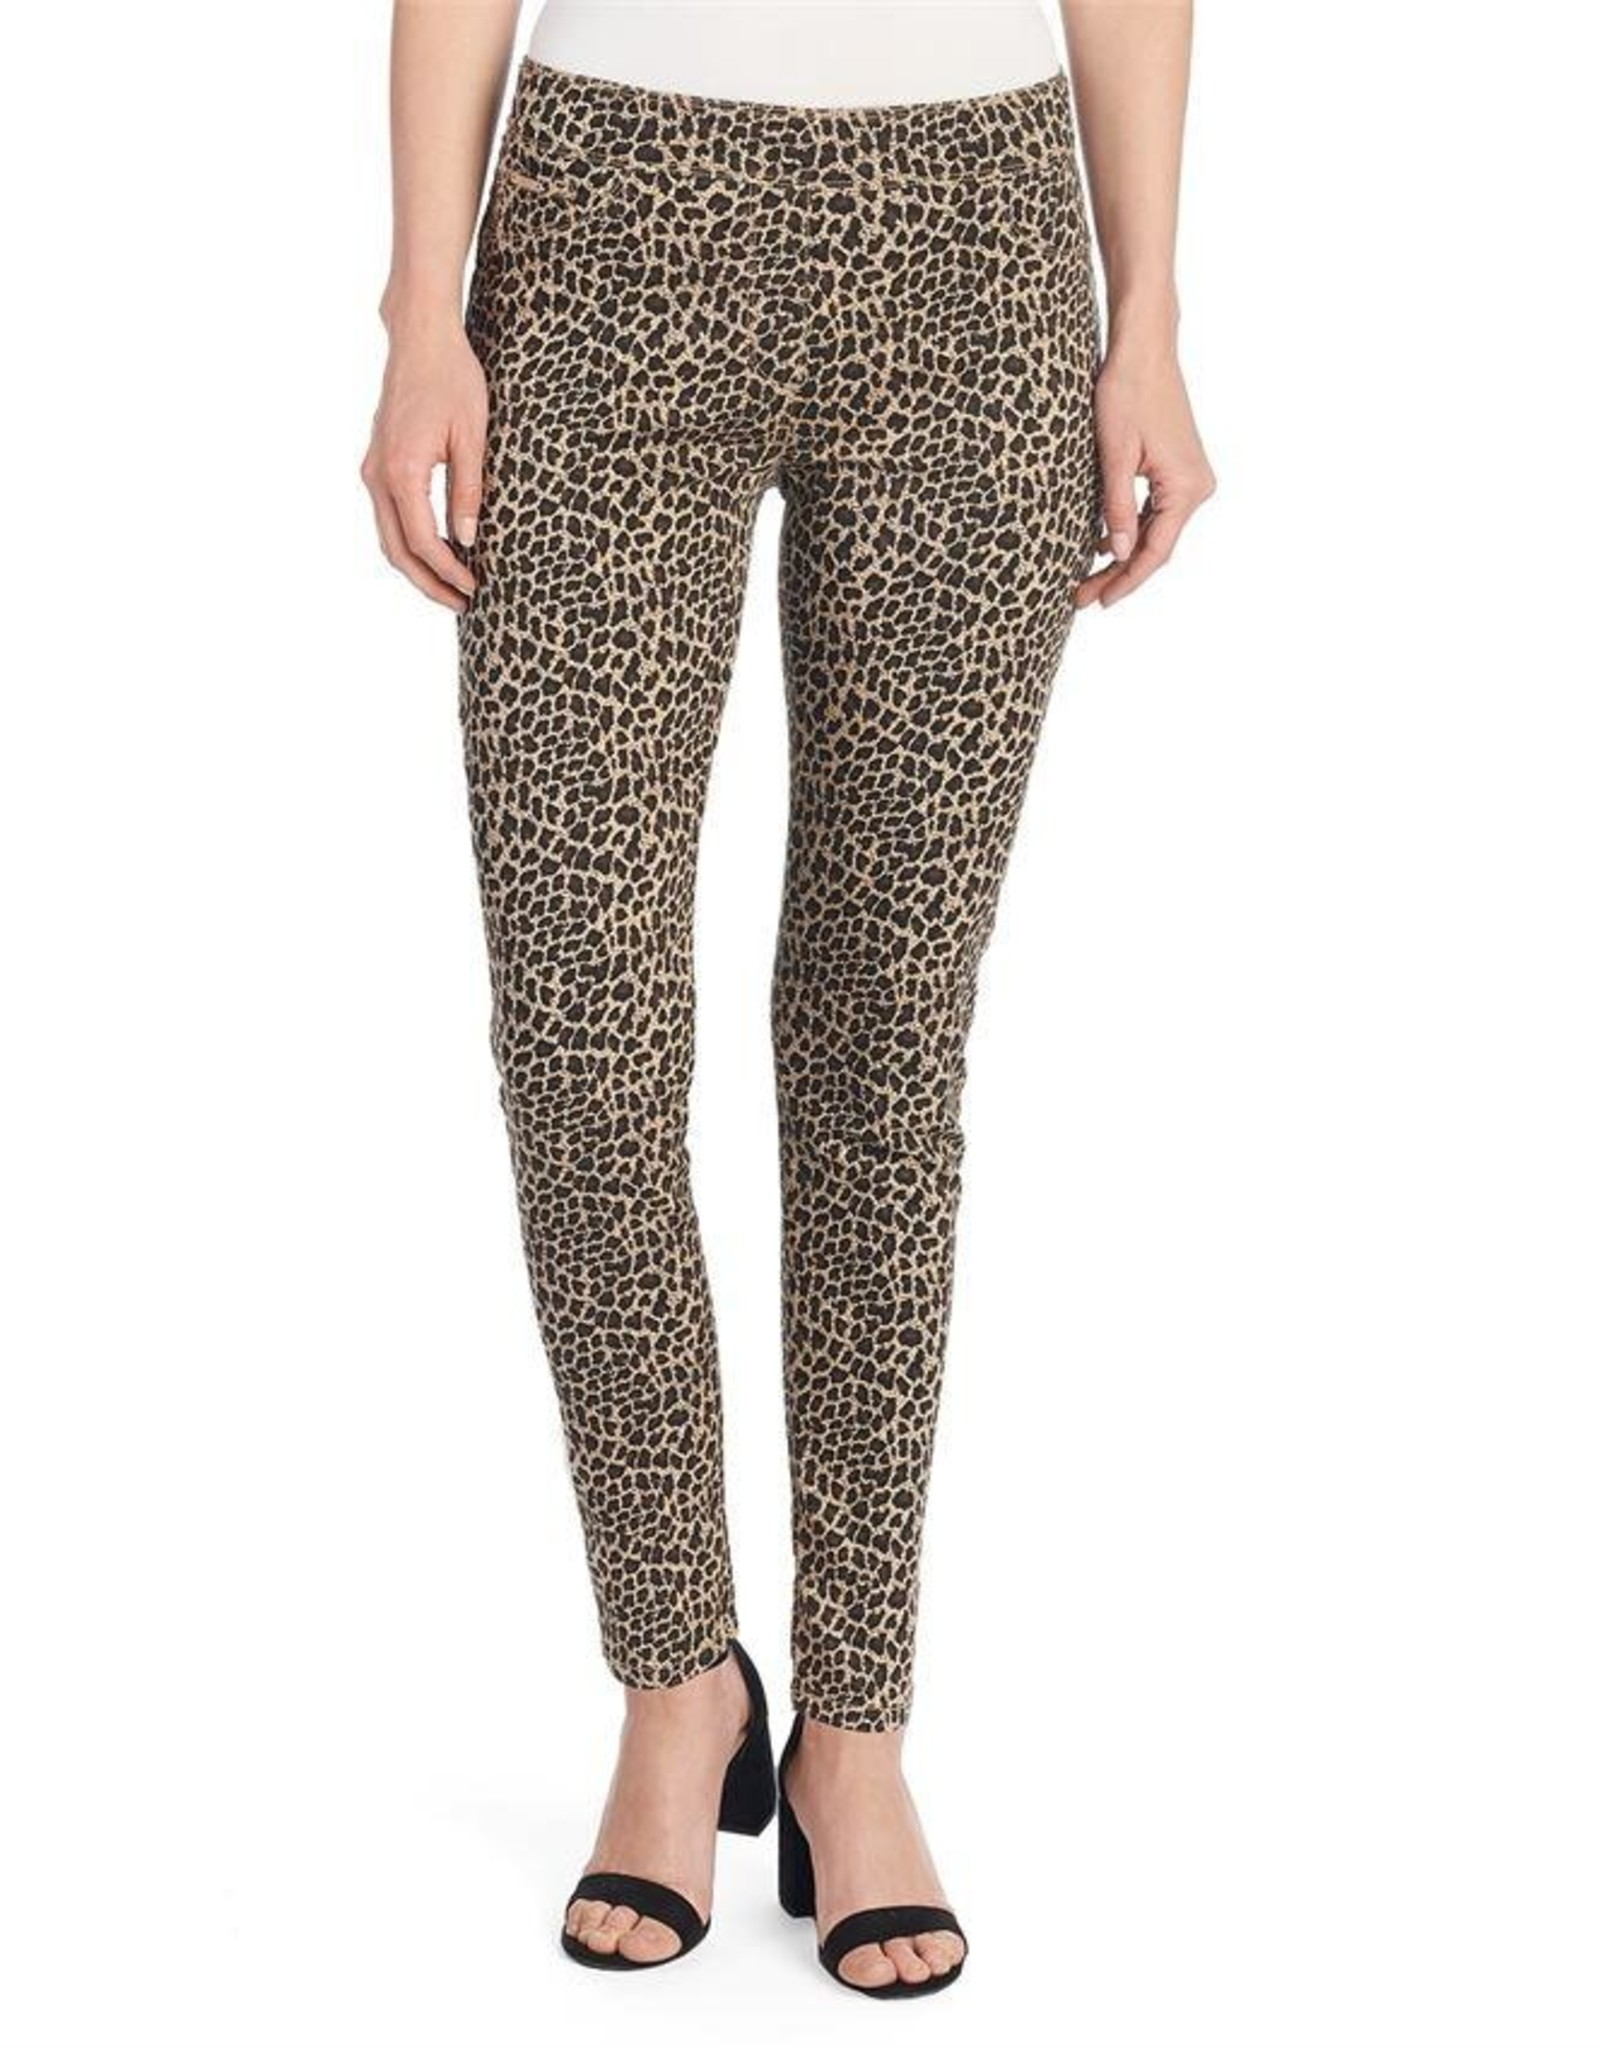 OMG Tan Leopard Pant